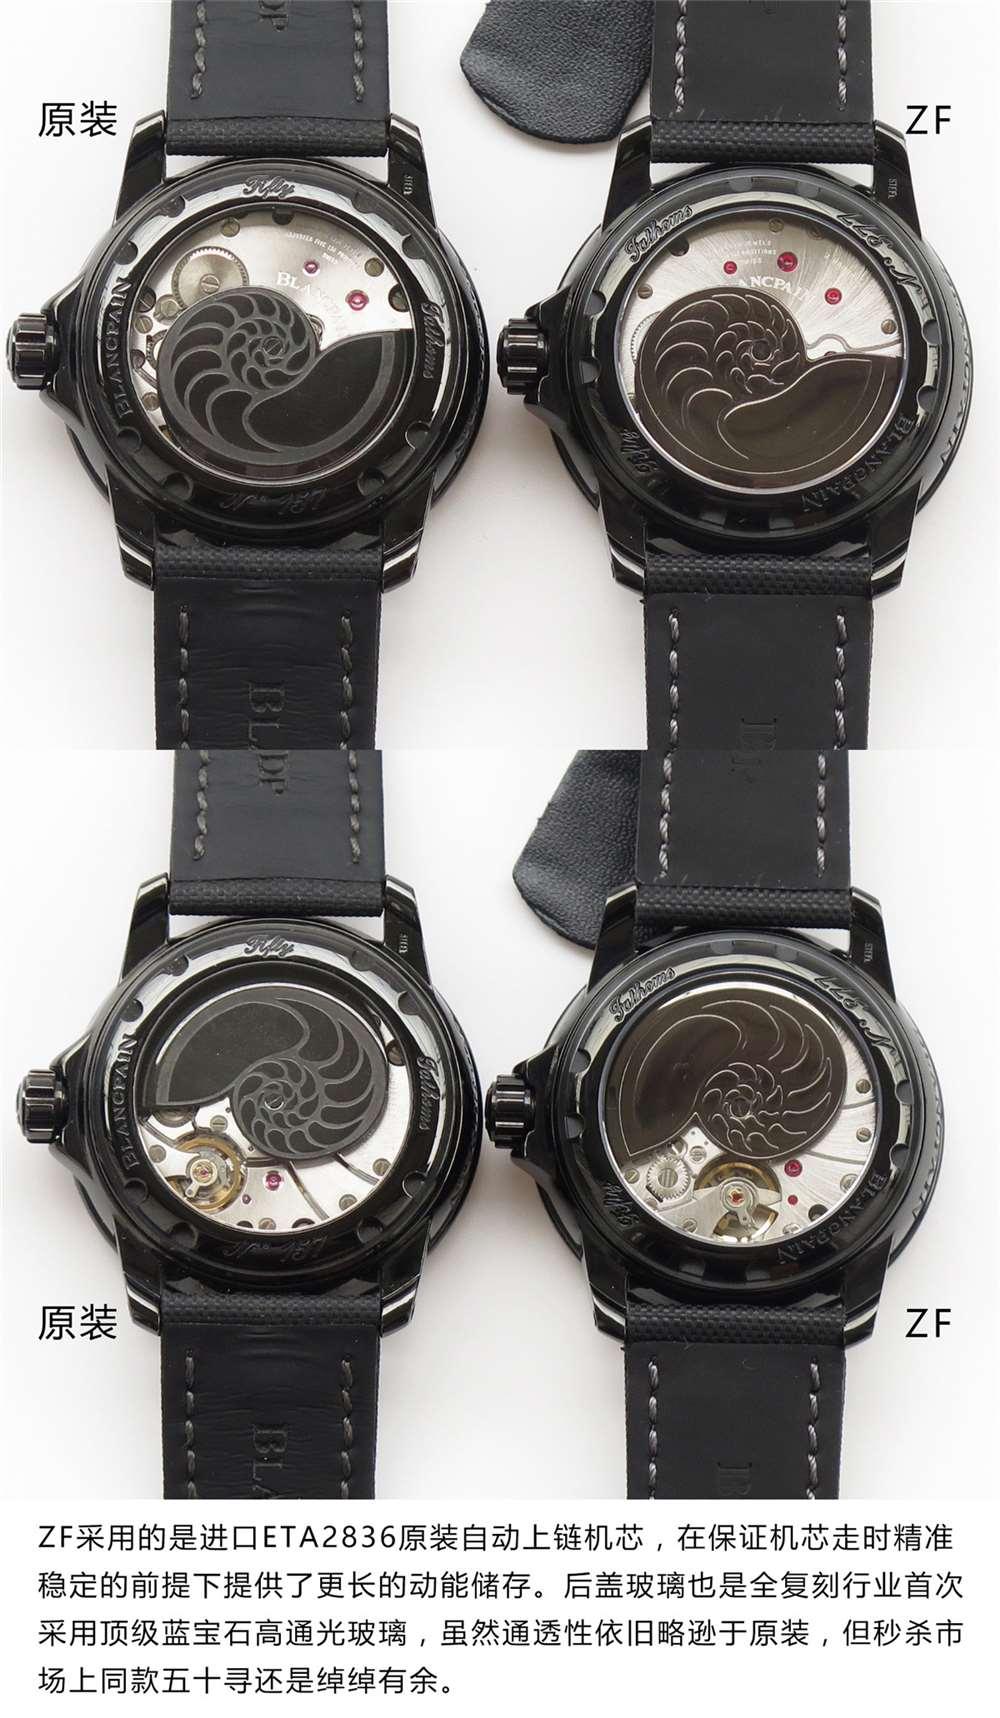 ZF厂宝珀五十噚黑武士5015-11c30-52对比正品评测